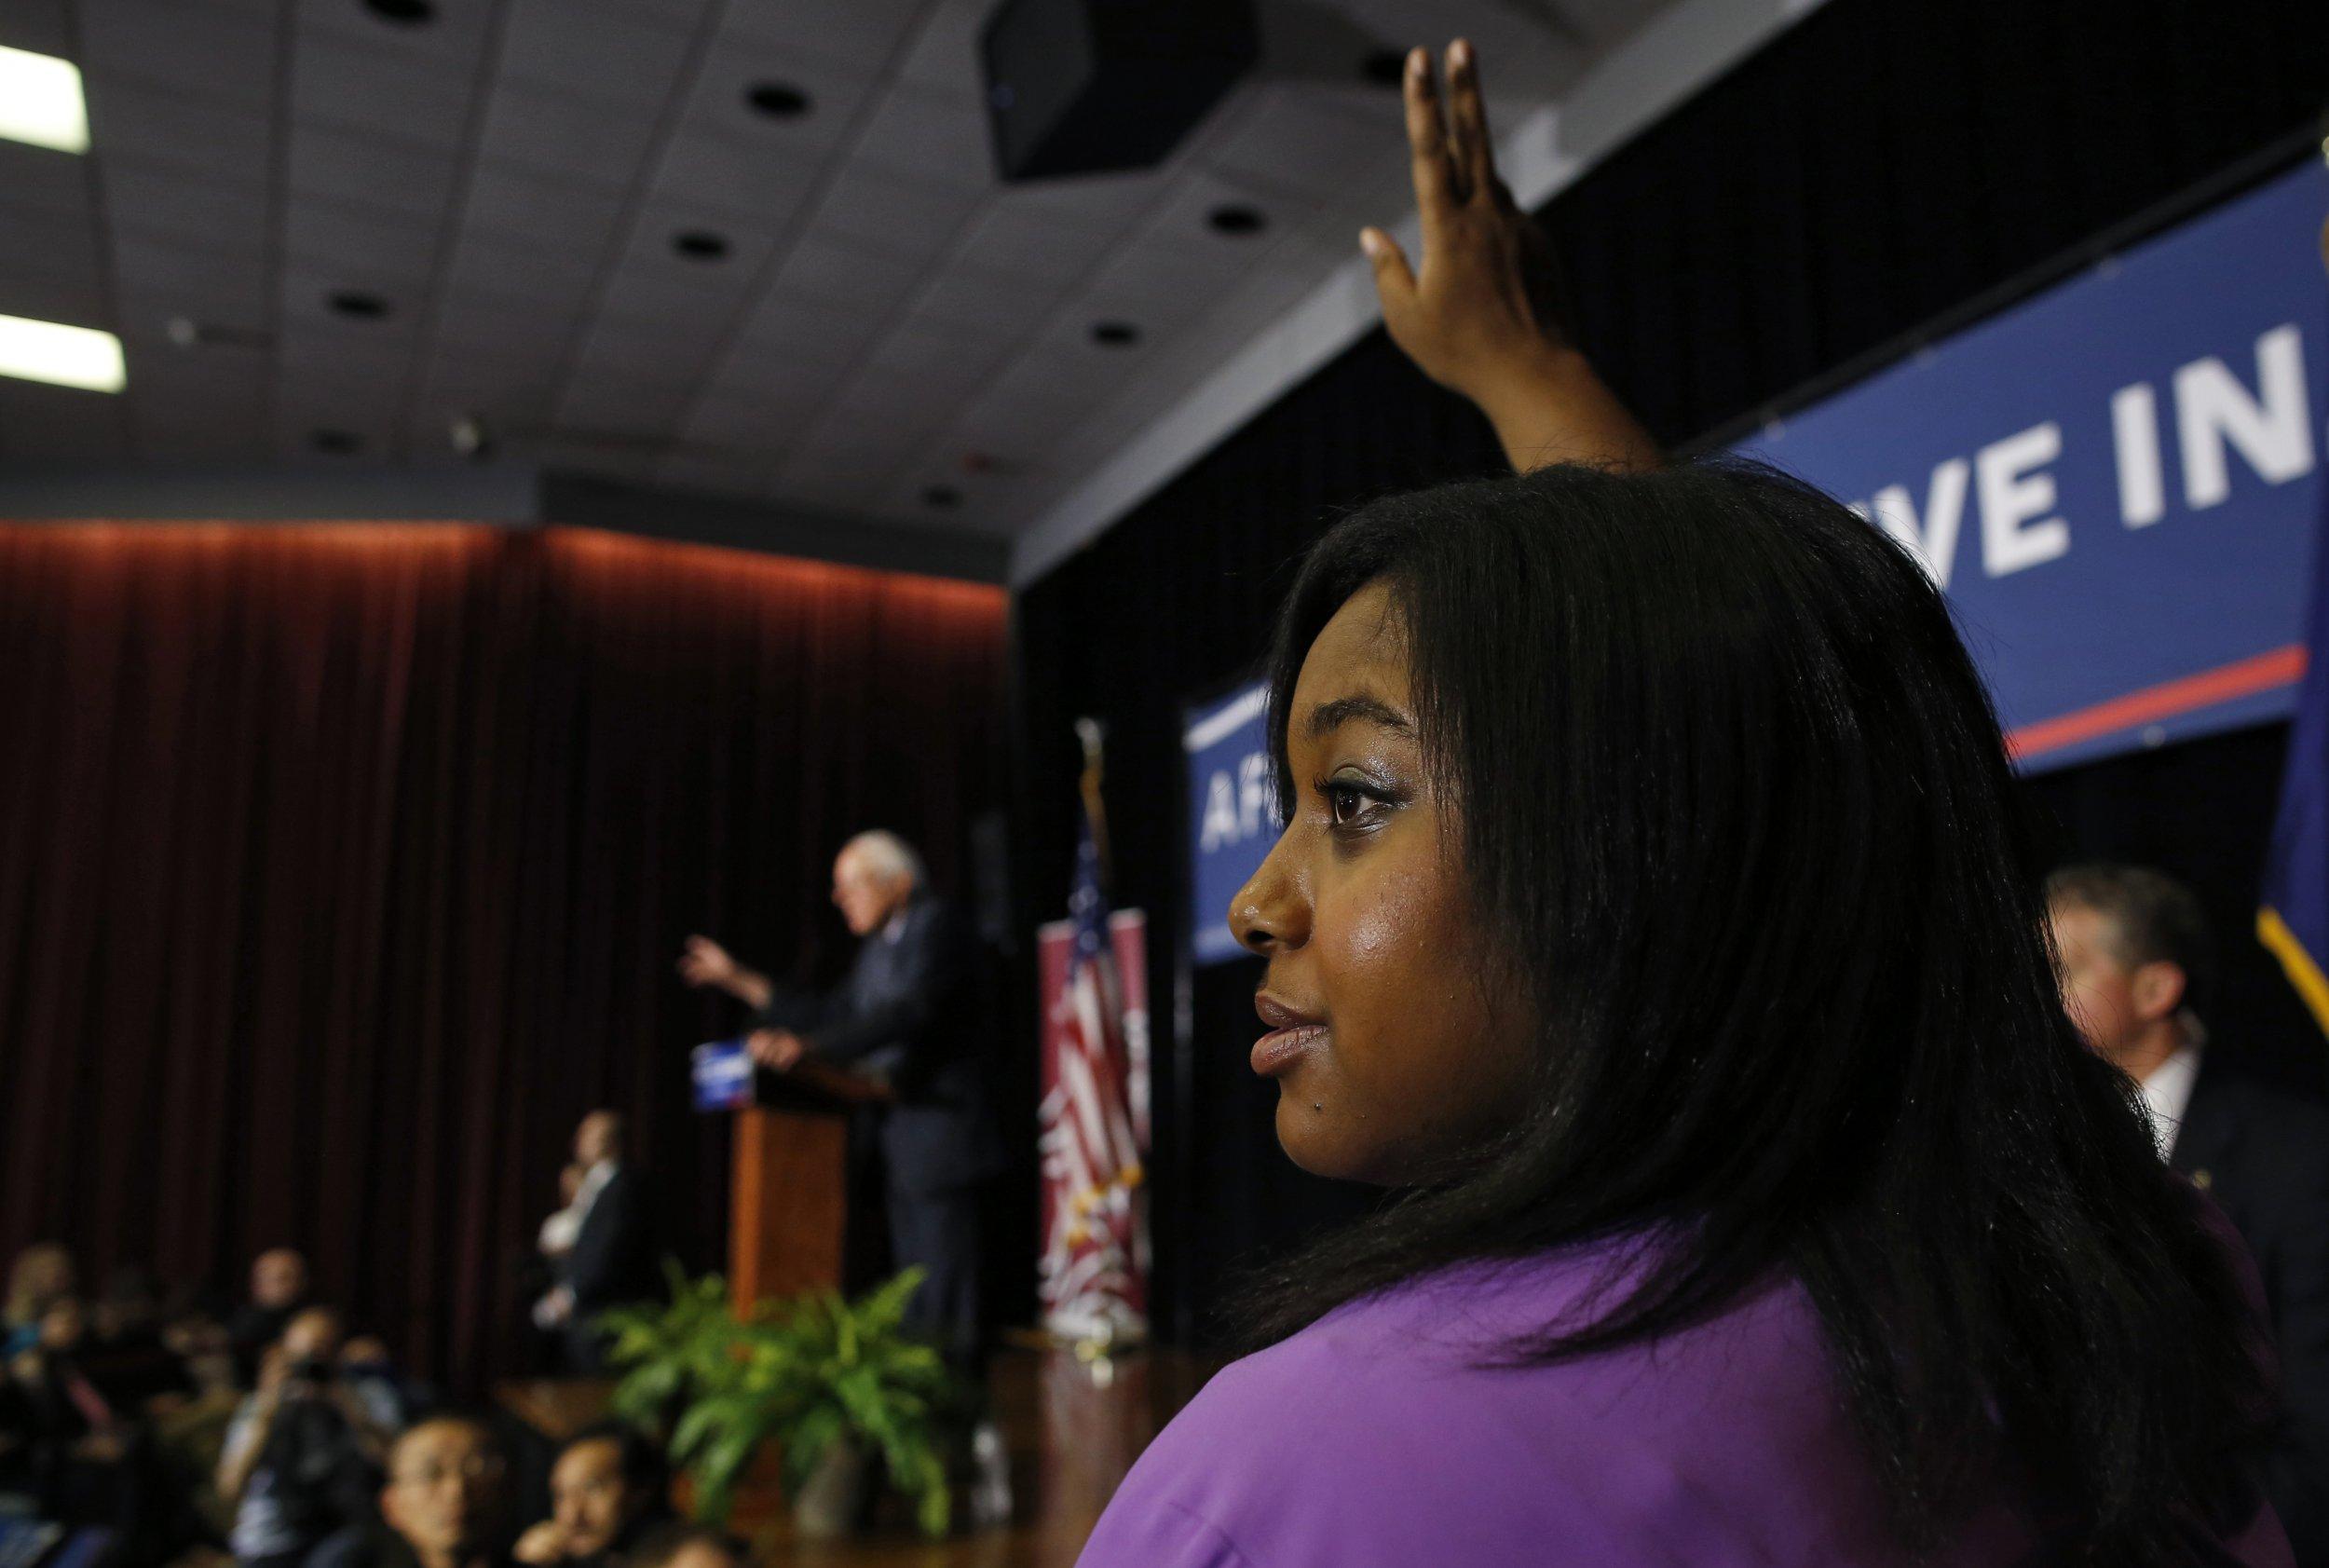 Myocardial Infarction: Why Eric Garner's Activist Daughter